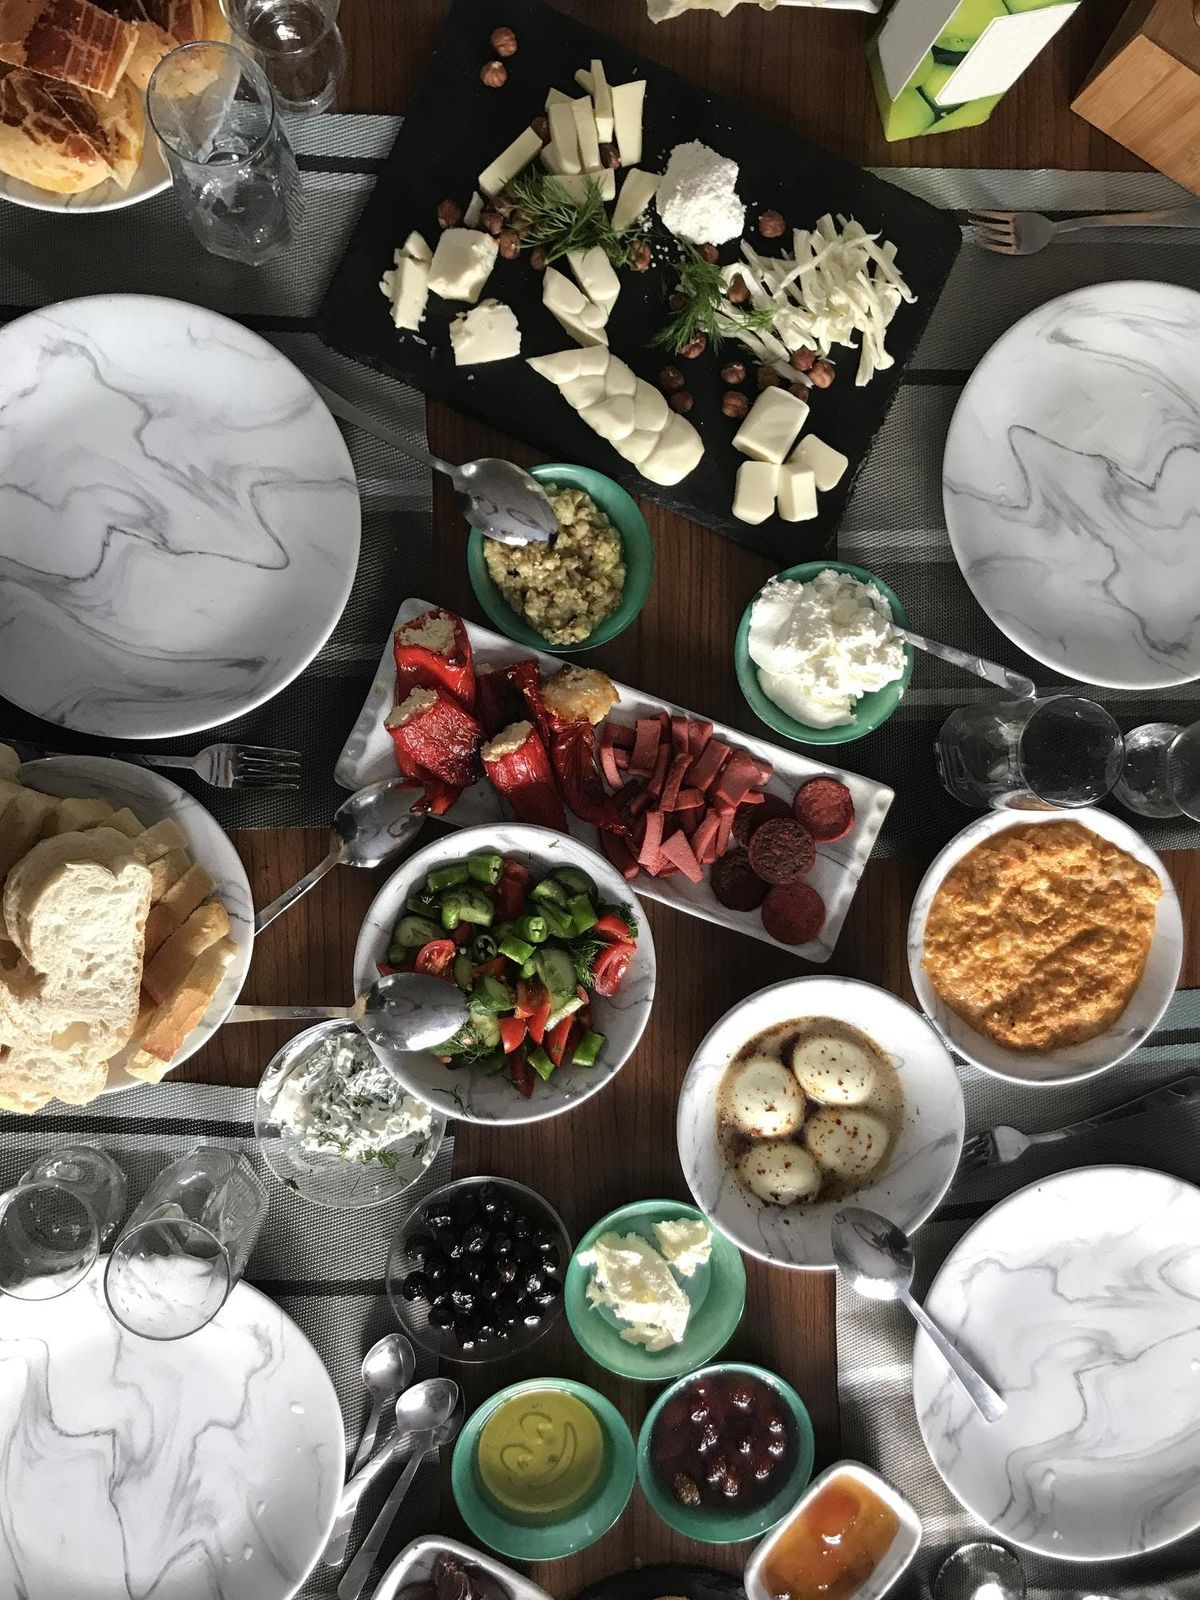 Special Event Assyrian Kitchen Sunday Brunch - 10 a.m.